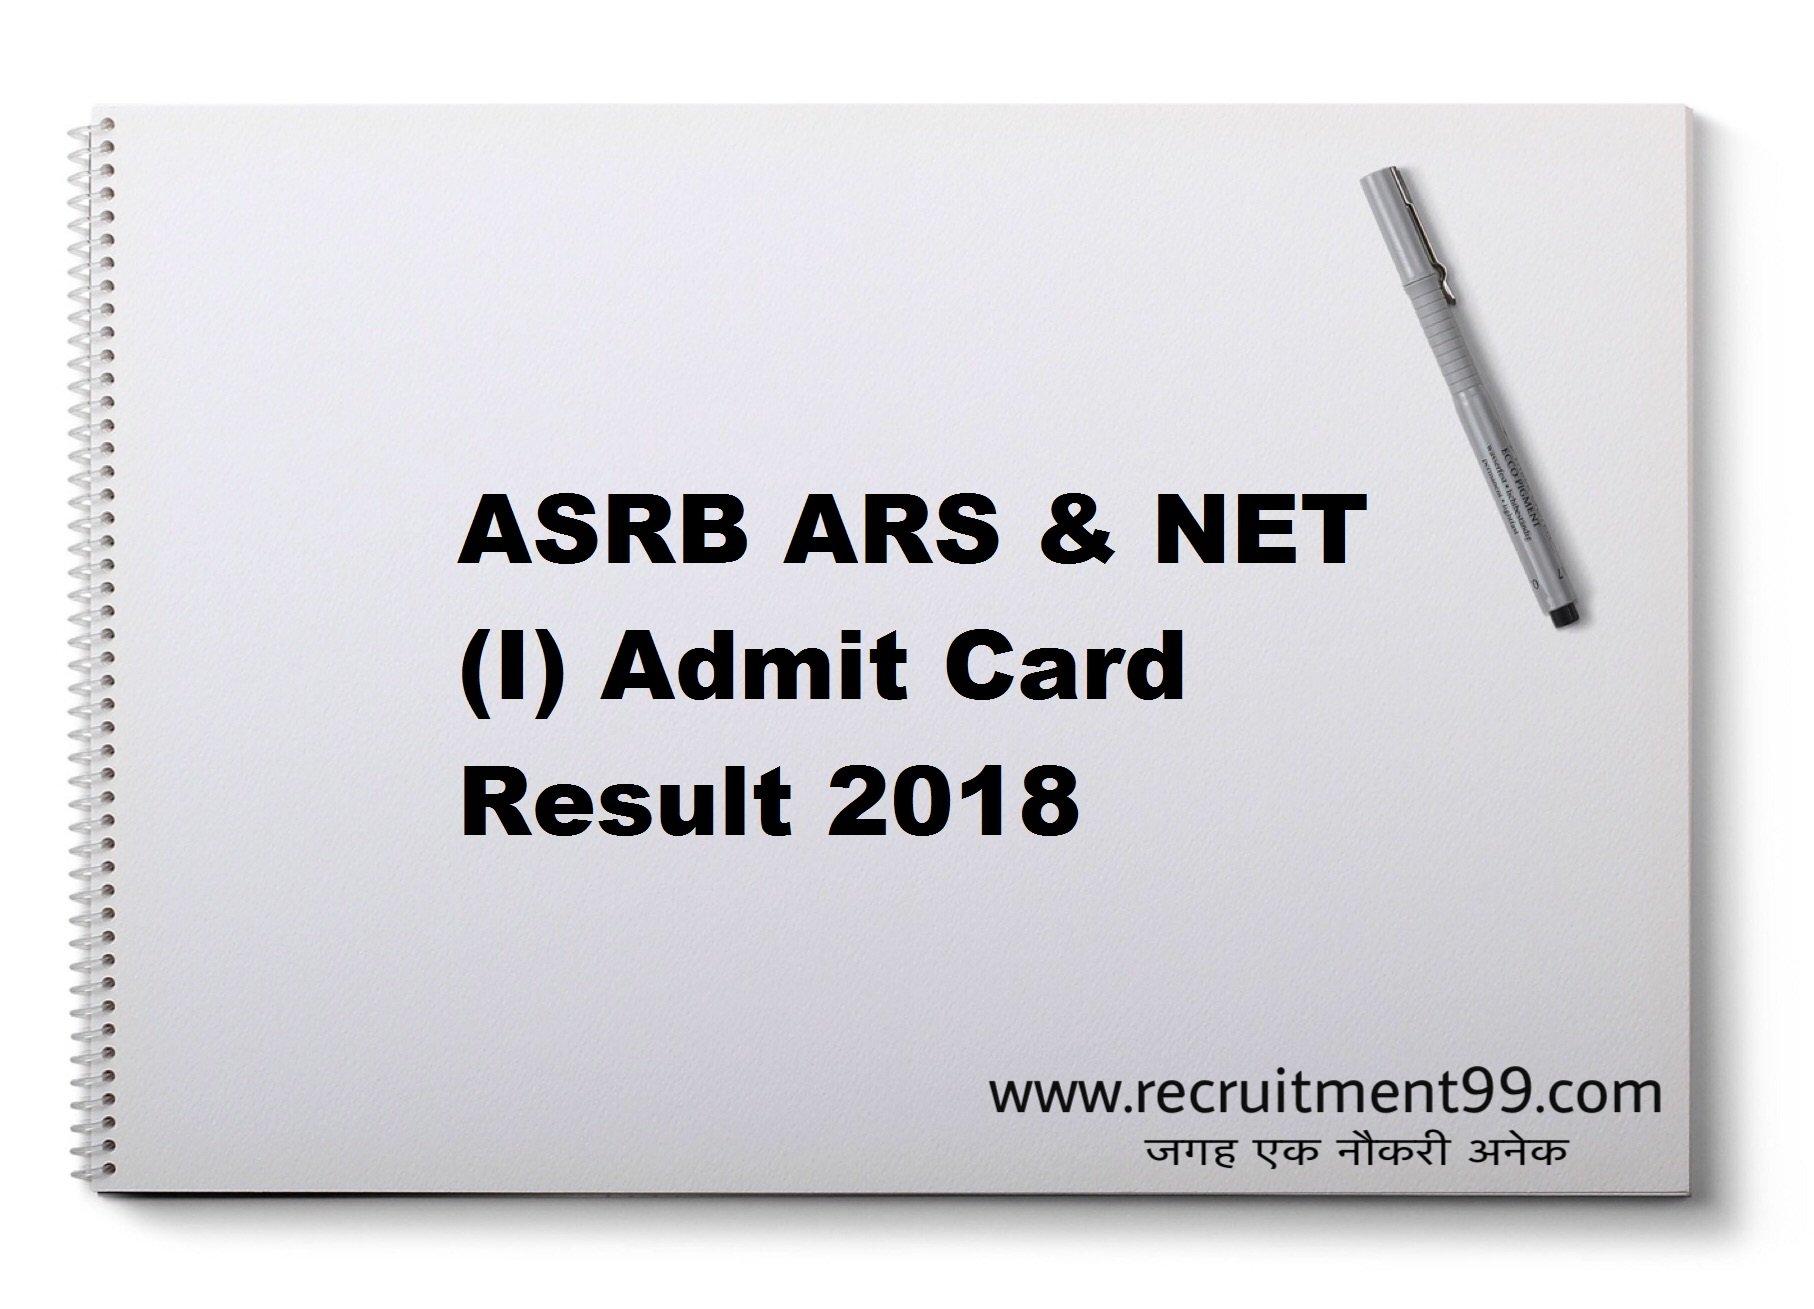 ASRB ARS & NET (I) Notification Admit Card Result 2018